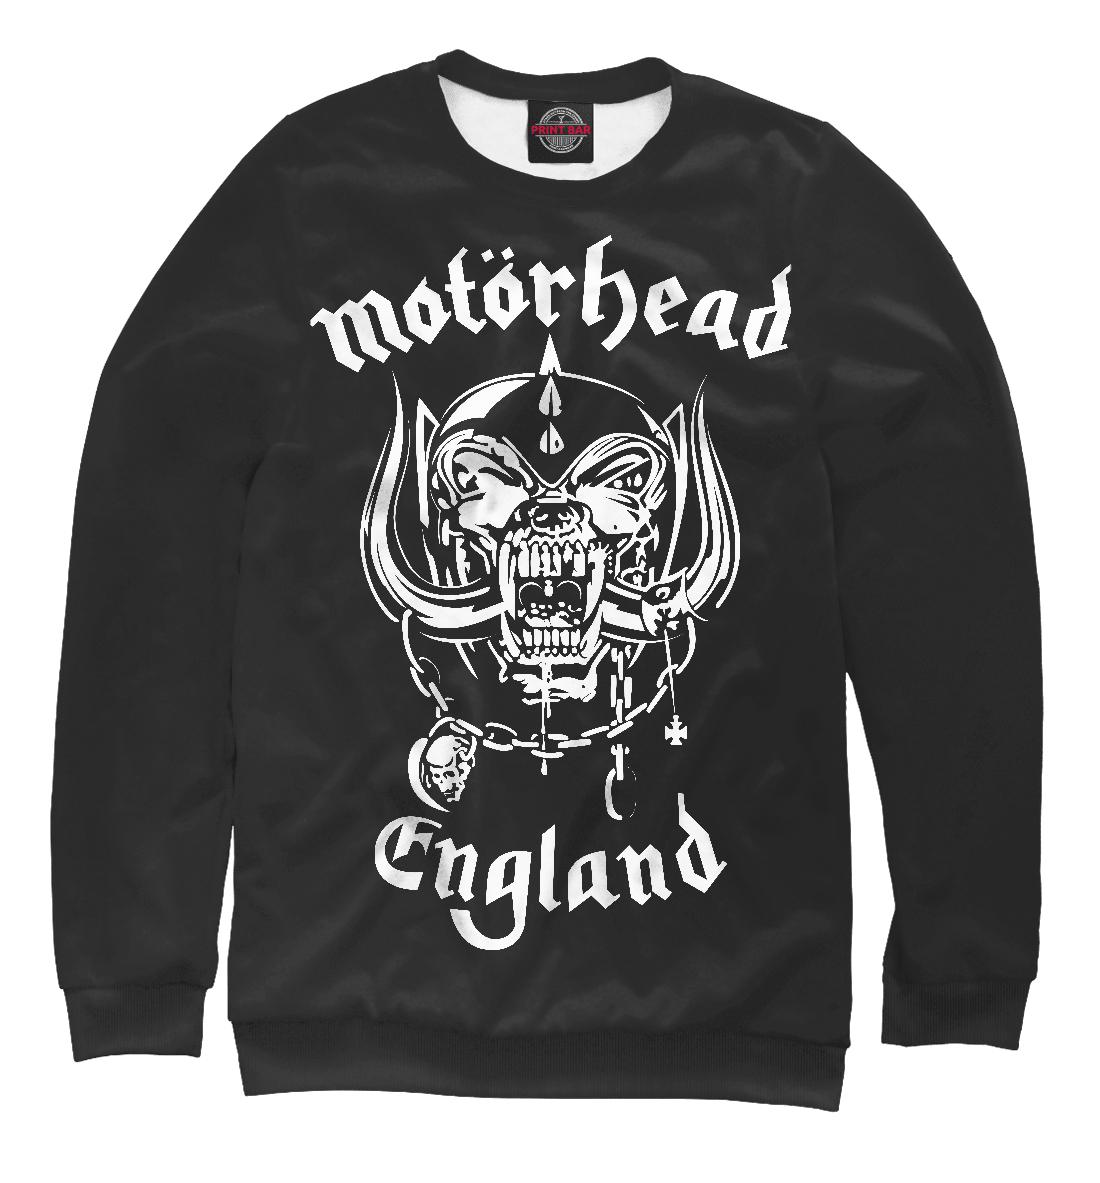 Купить Motorhead, Printbar, Свитшоты, MOT-832970-swi-1